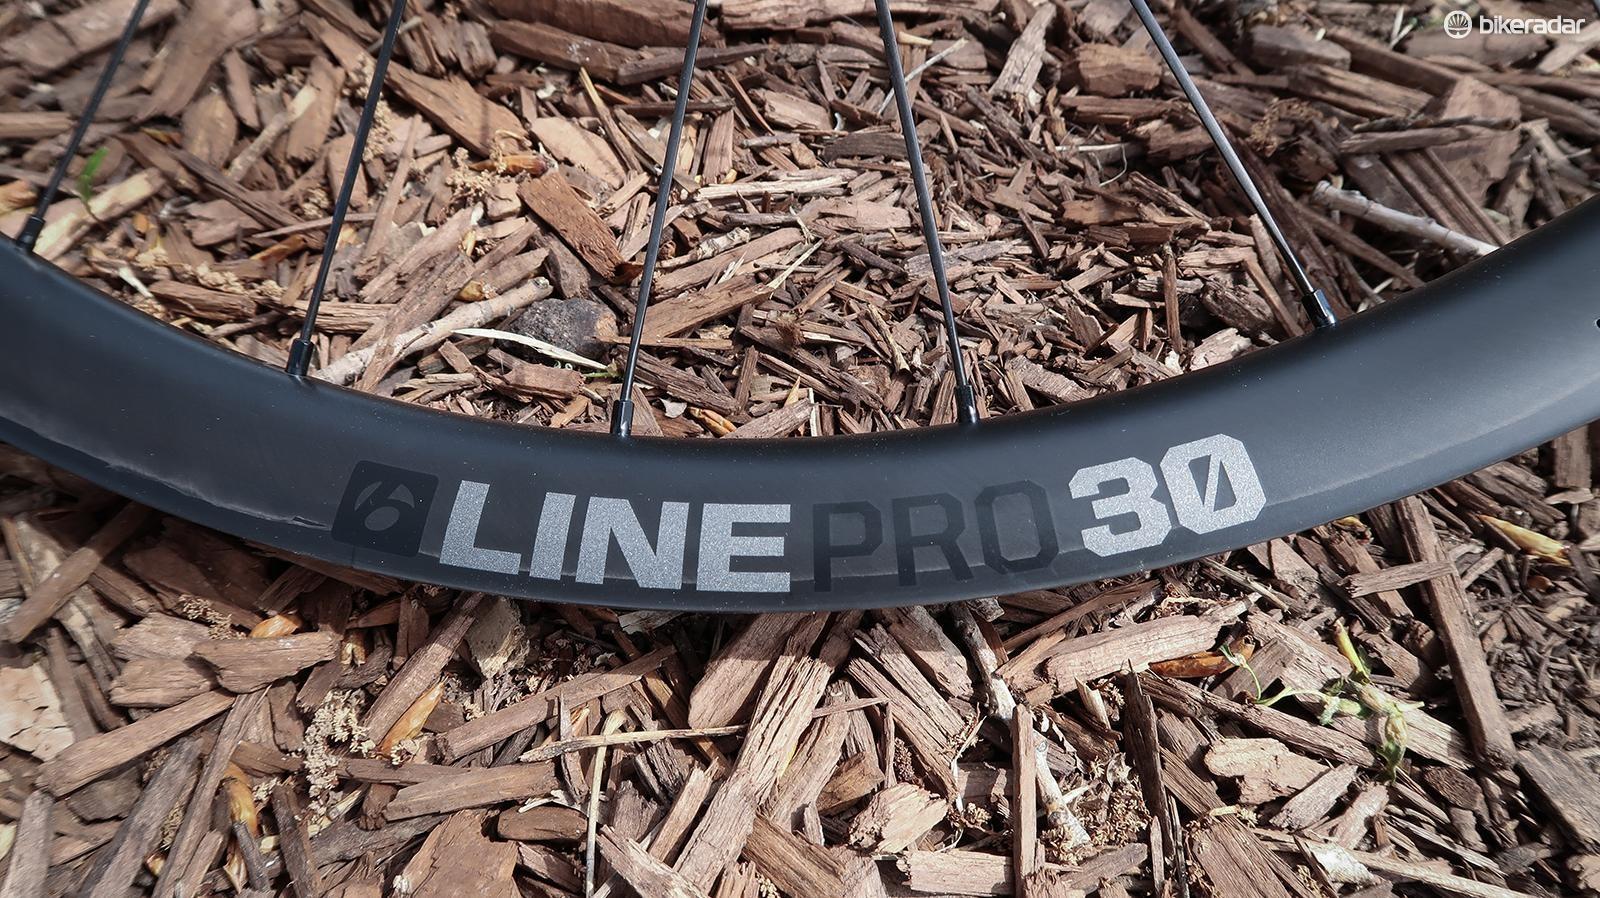 The Bontrager Line Pro 30 wheelset